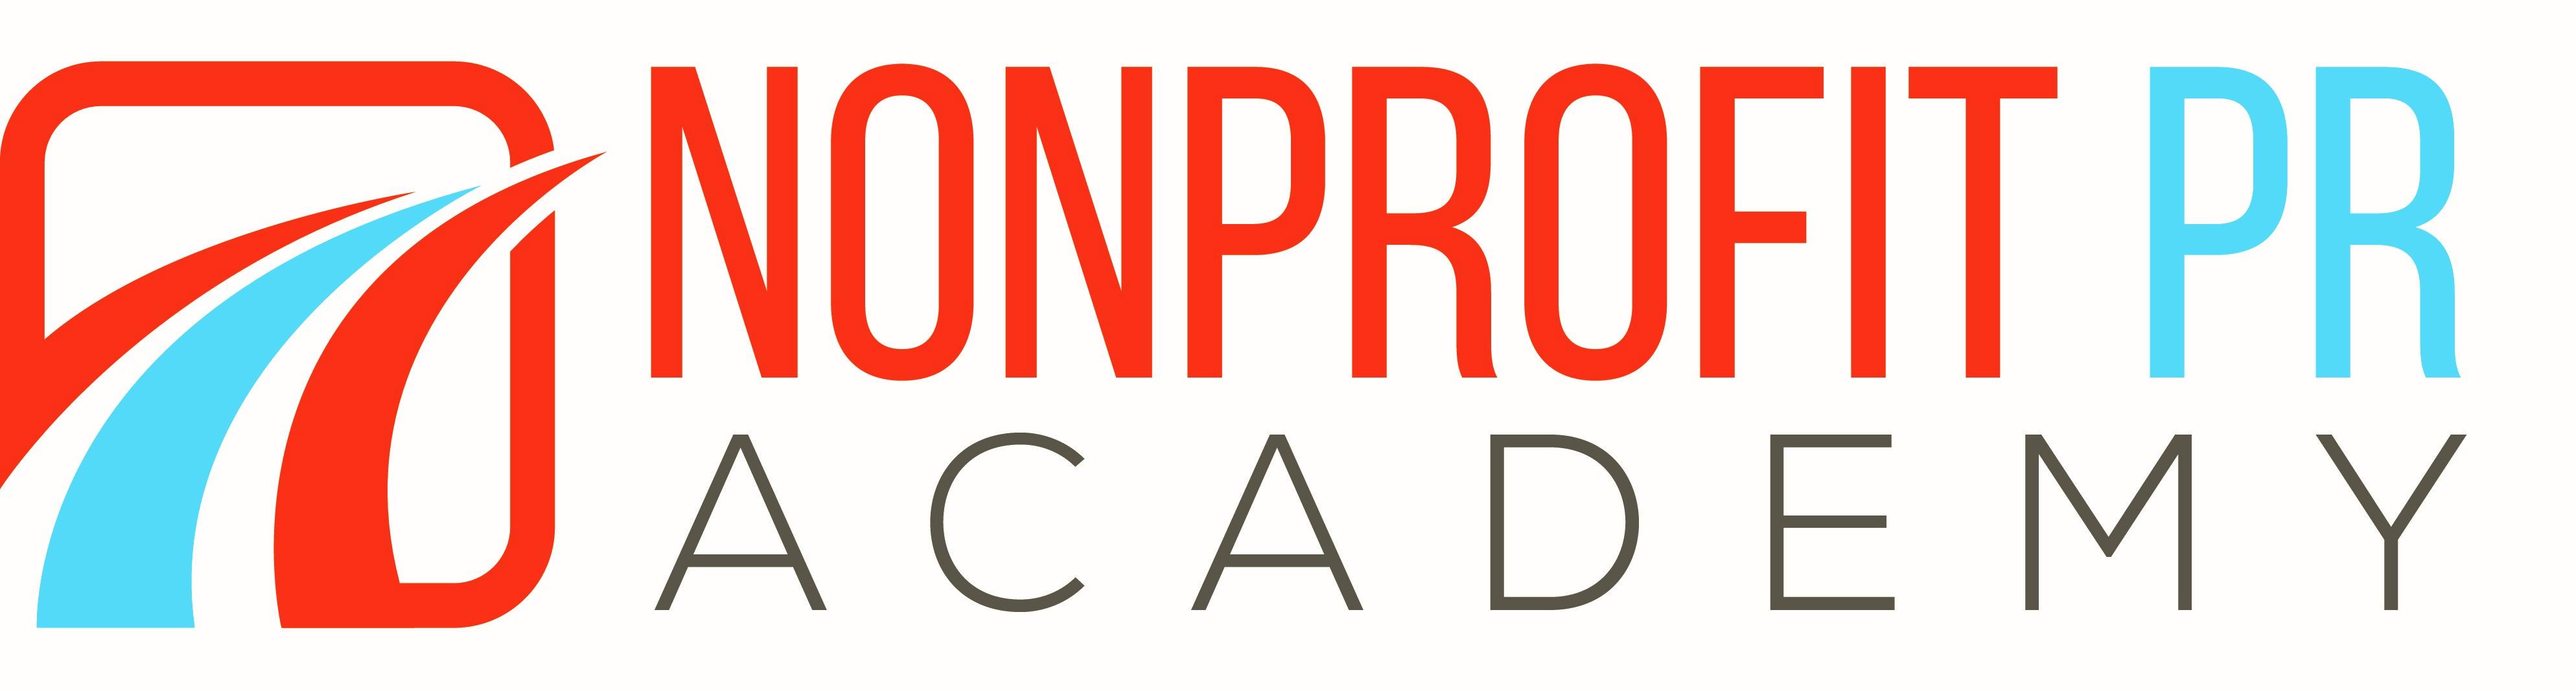 Nonprofit_PR_Academy_social